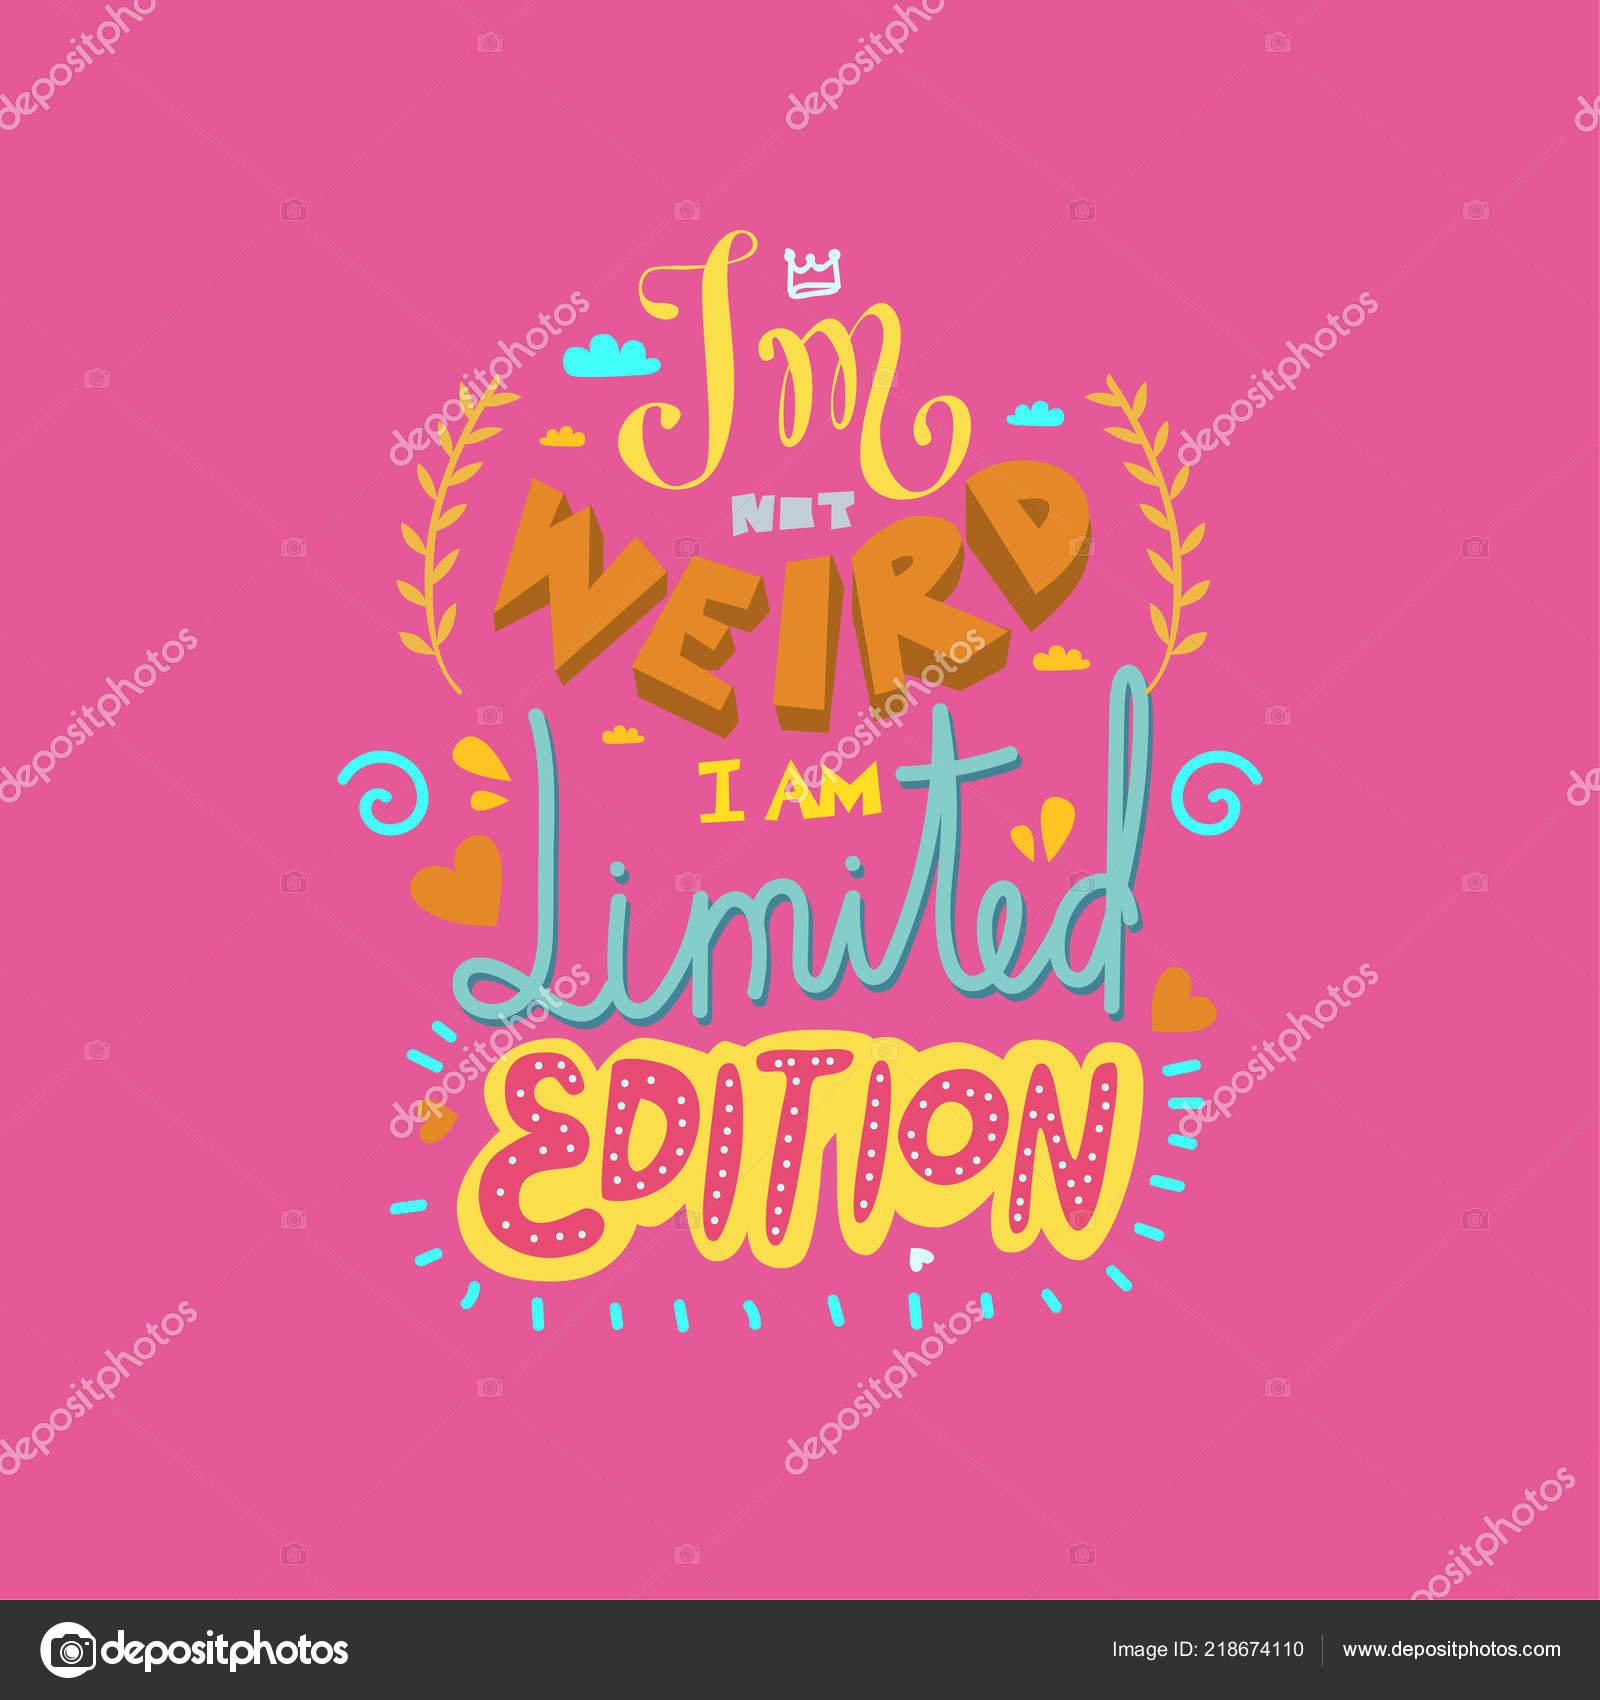 Divertido Mano Dibujado Letras Motivadoras Inspiración